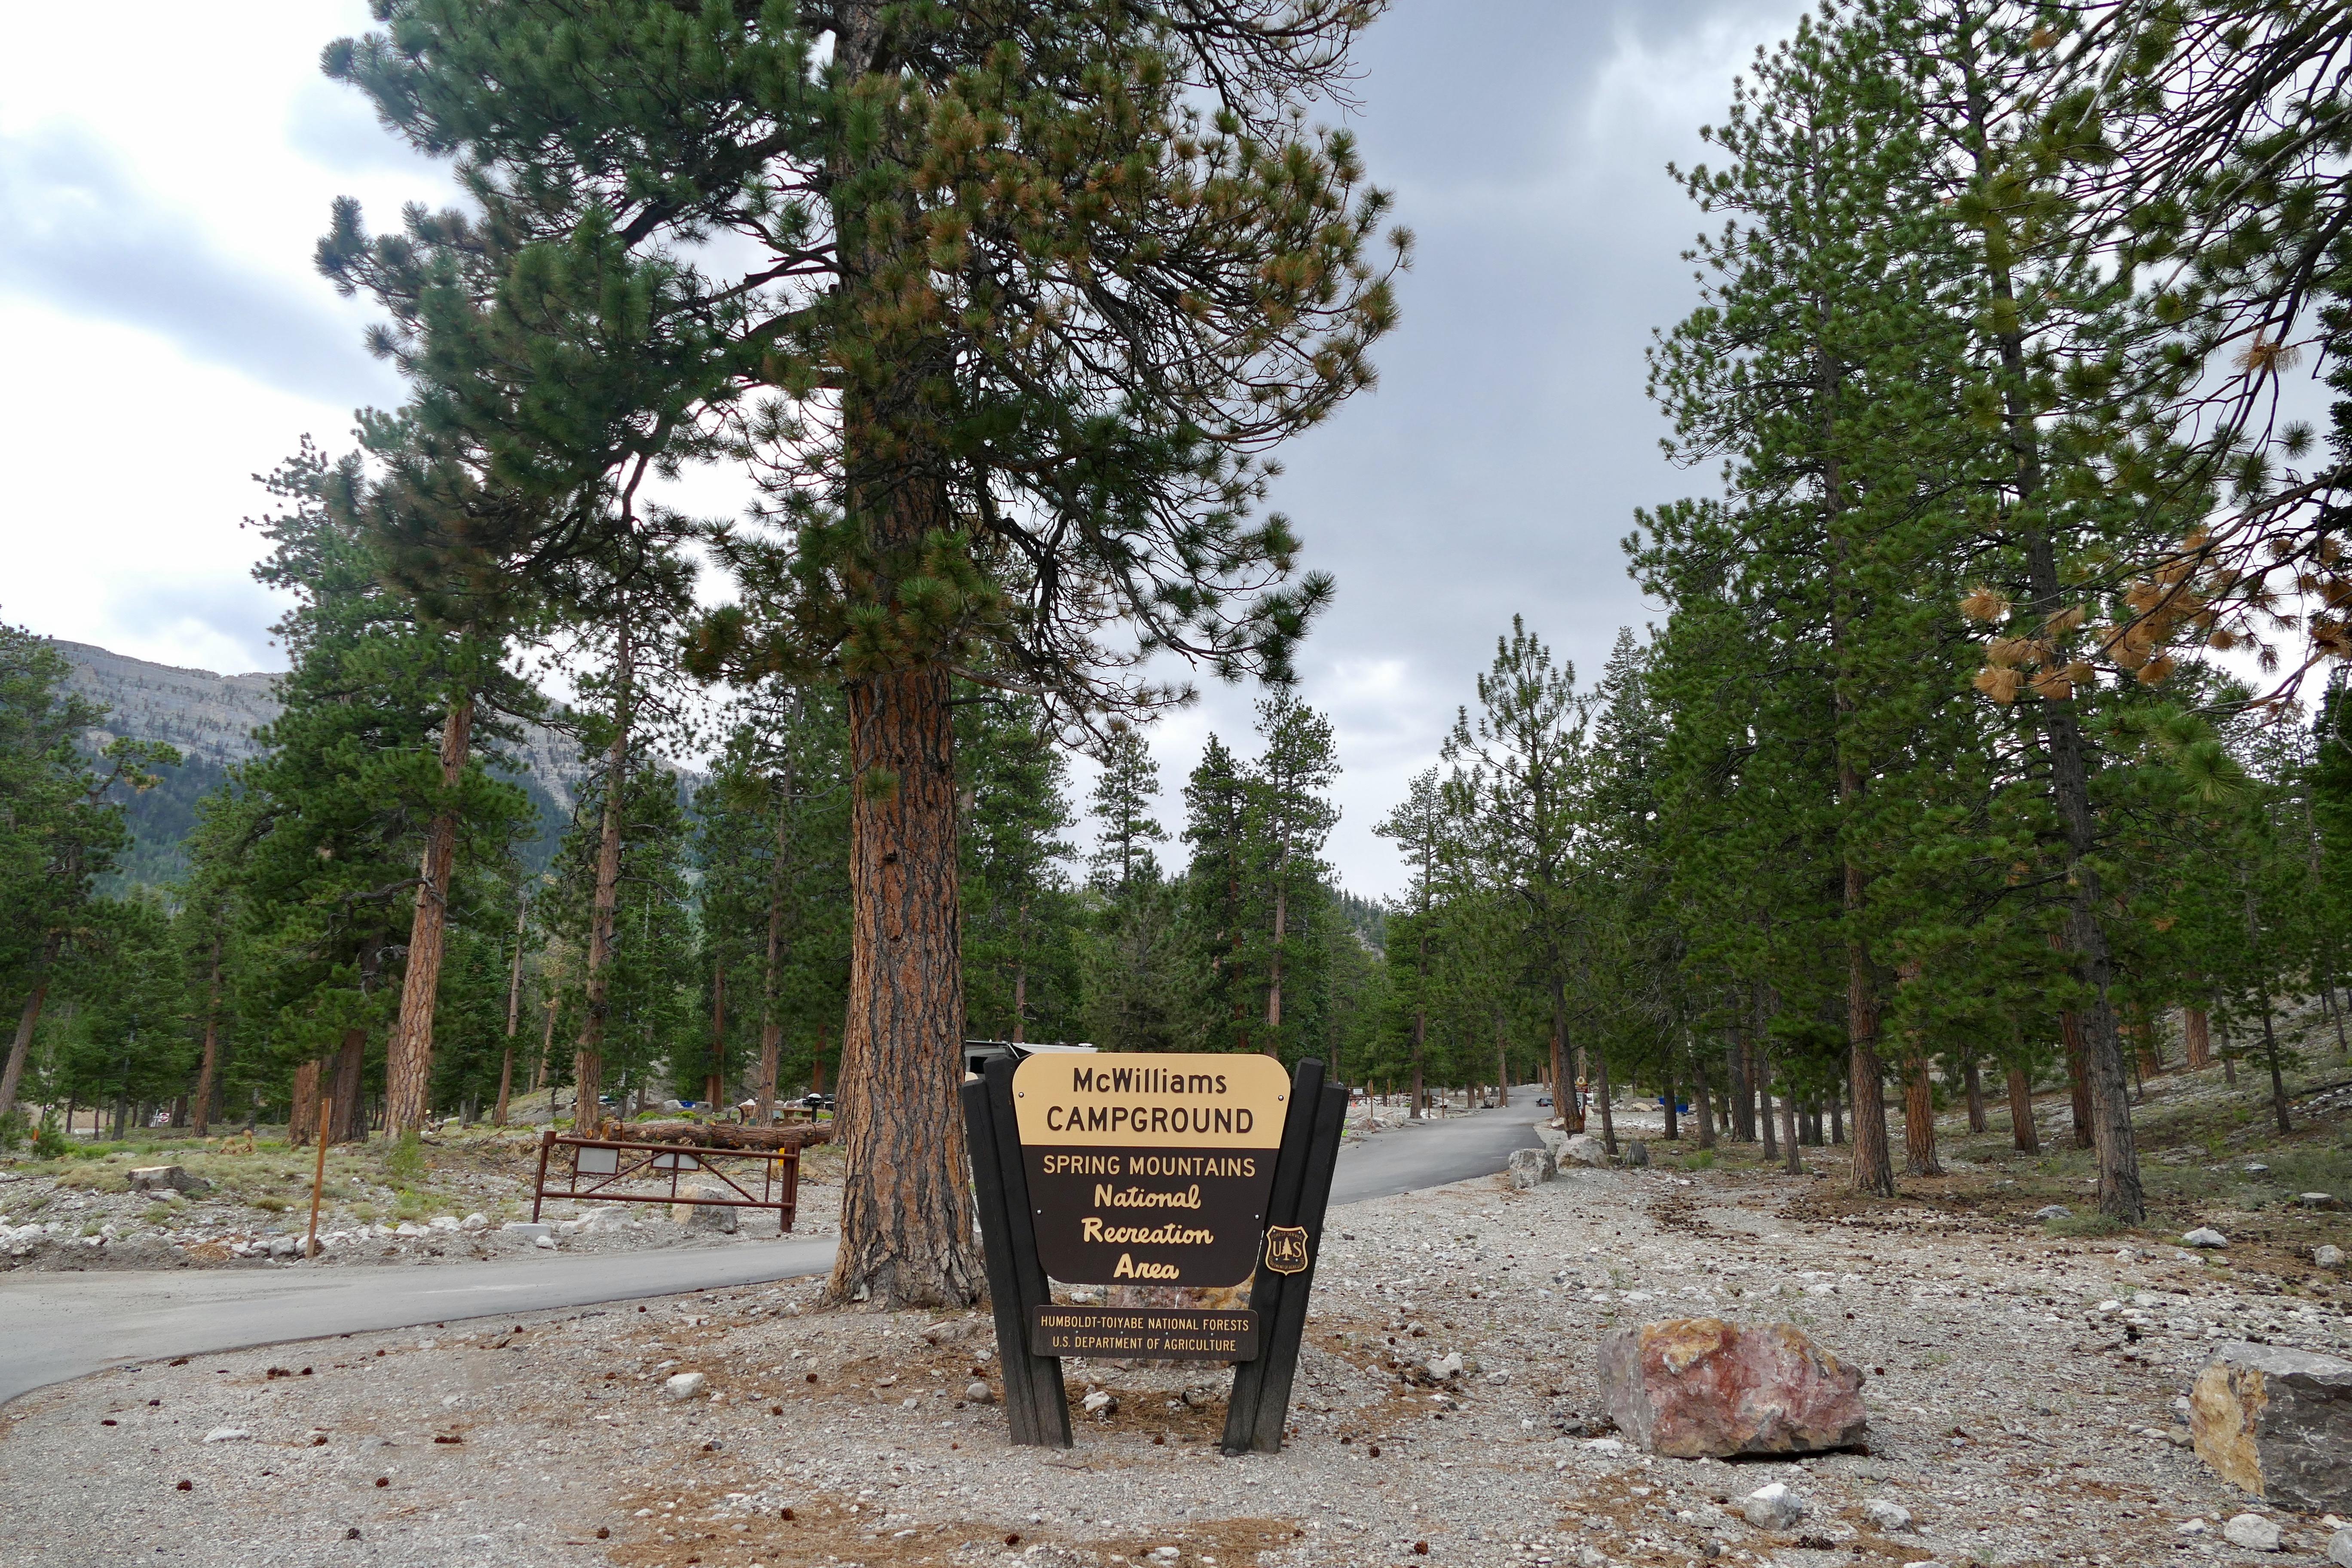 McWilliams Campground | Las Vegas, NV | Go Mt. Charleston